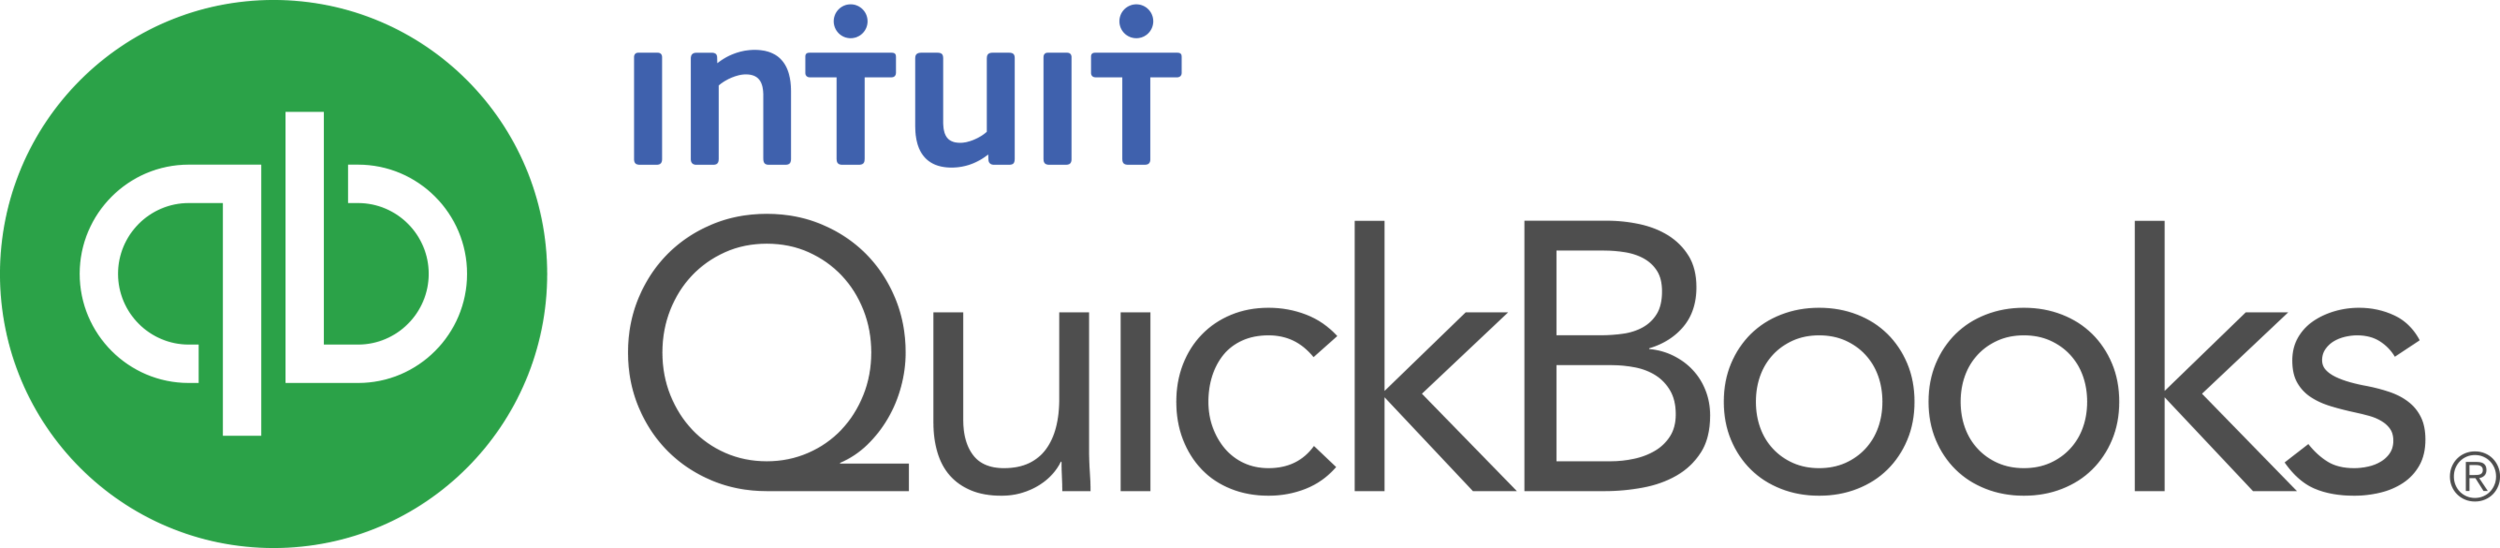 quickbooks-logo-1.png